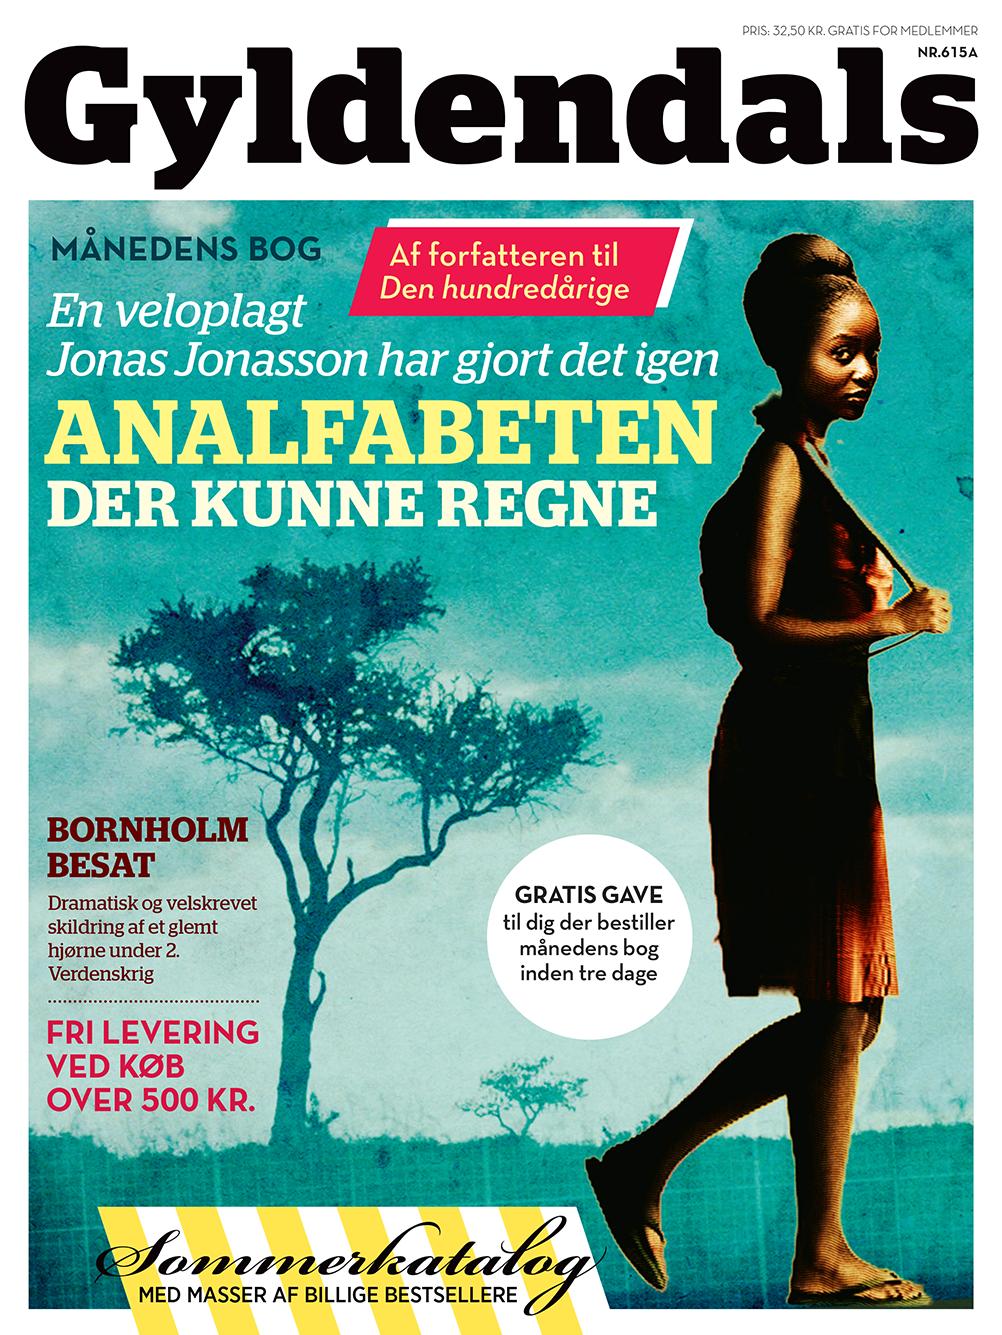 gbk_magazine_2.png